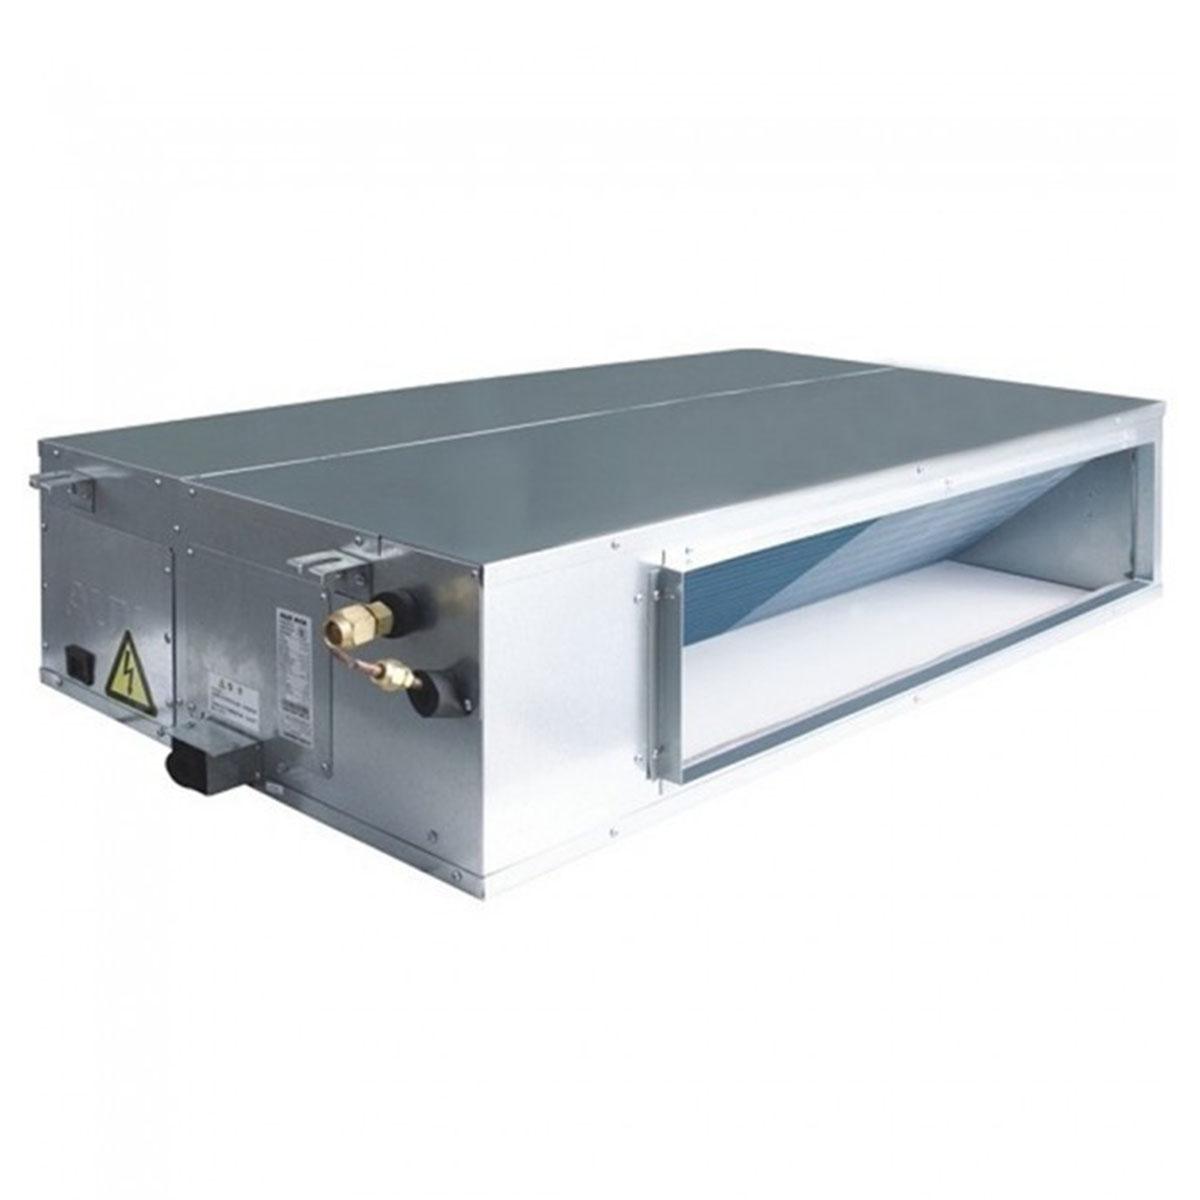 Aparat de aer conditionat tip duct Gree GFH42K3FI-GUHD42NM3FO Inverter 42.000 BTU 15